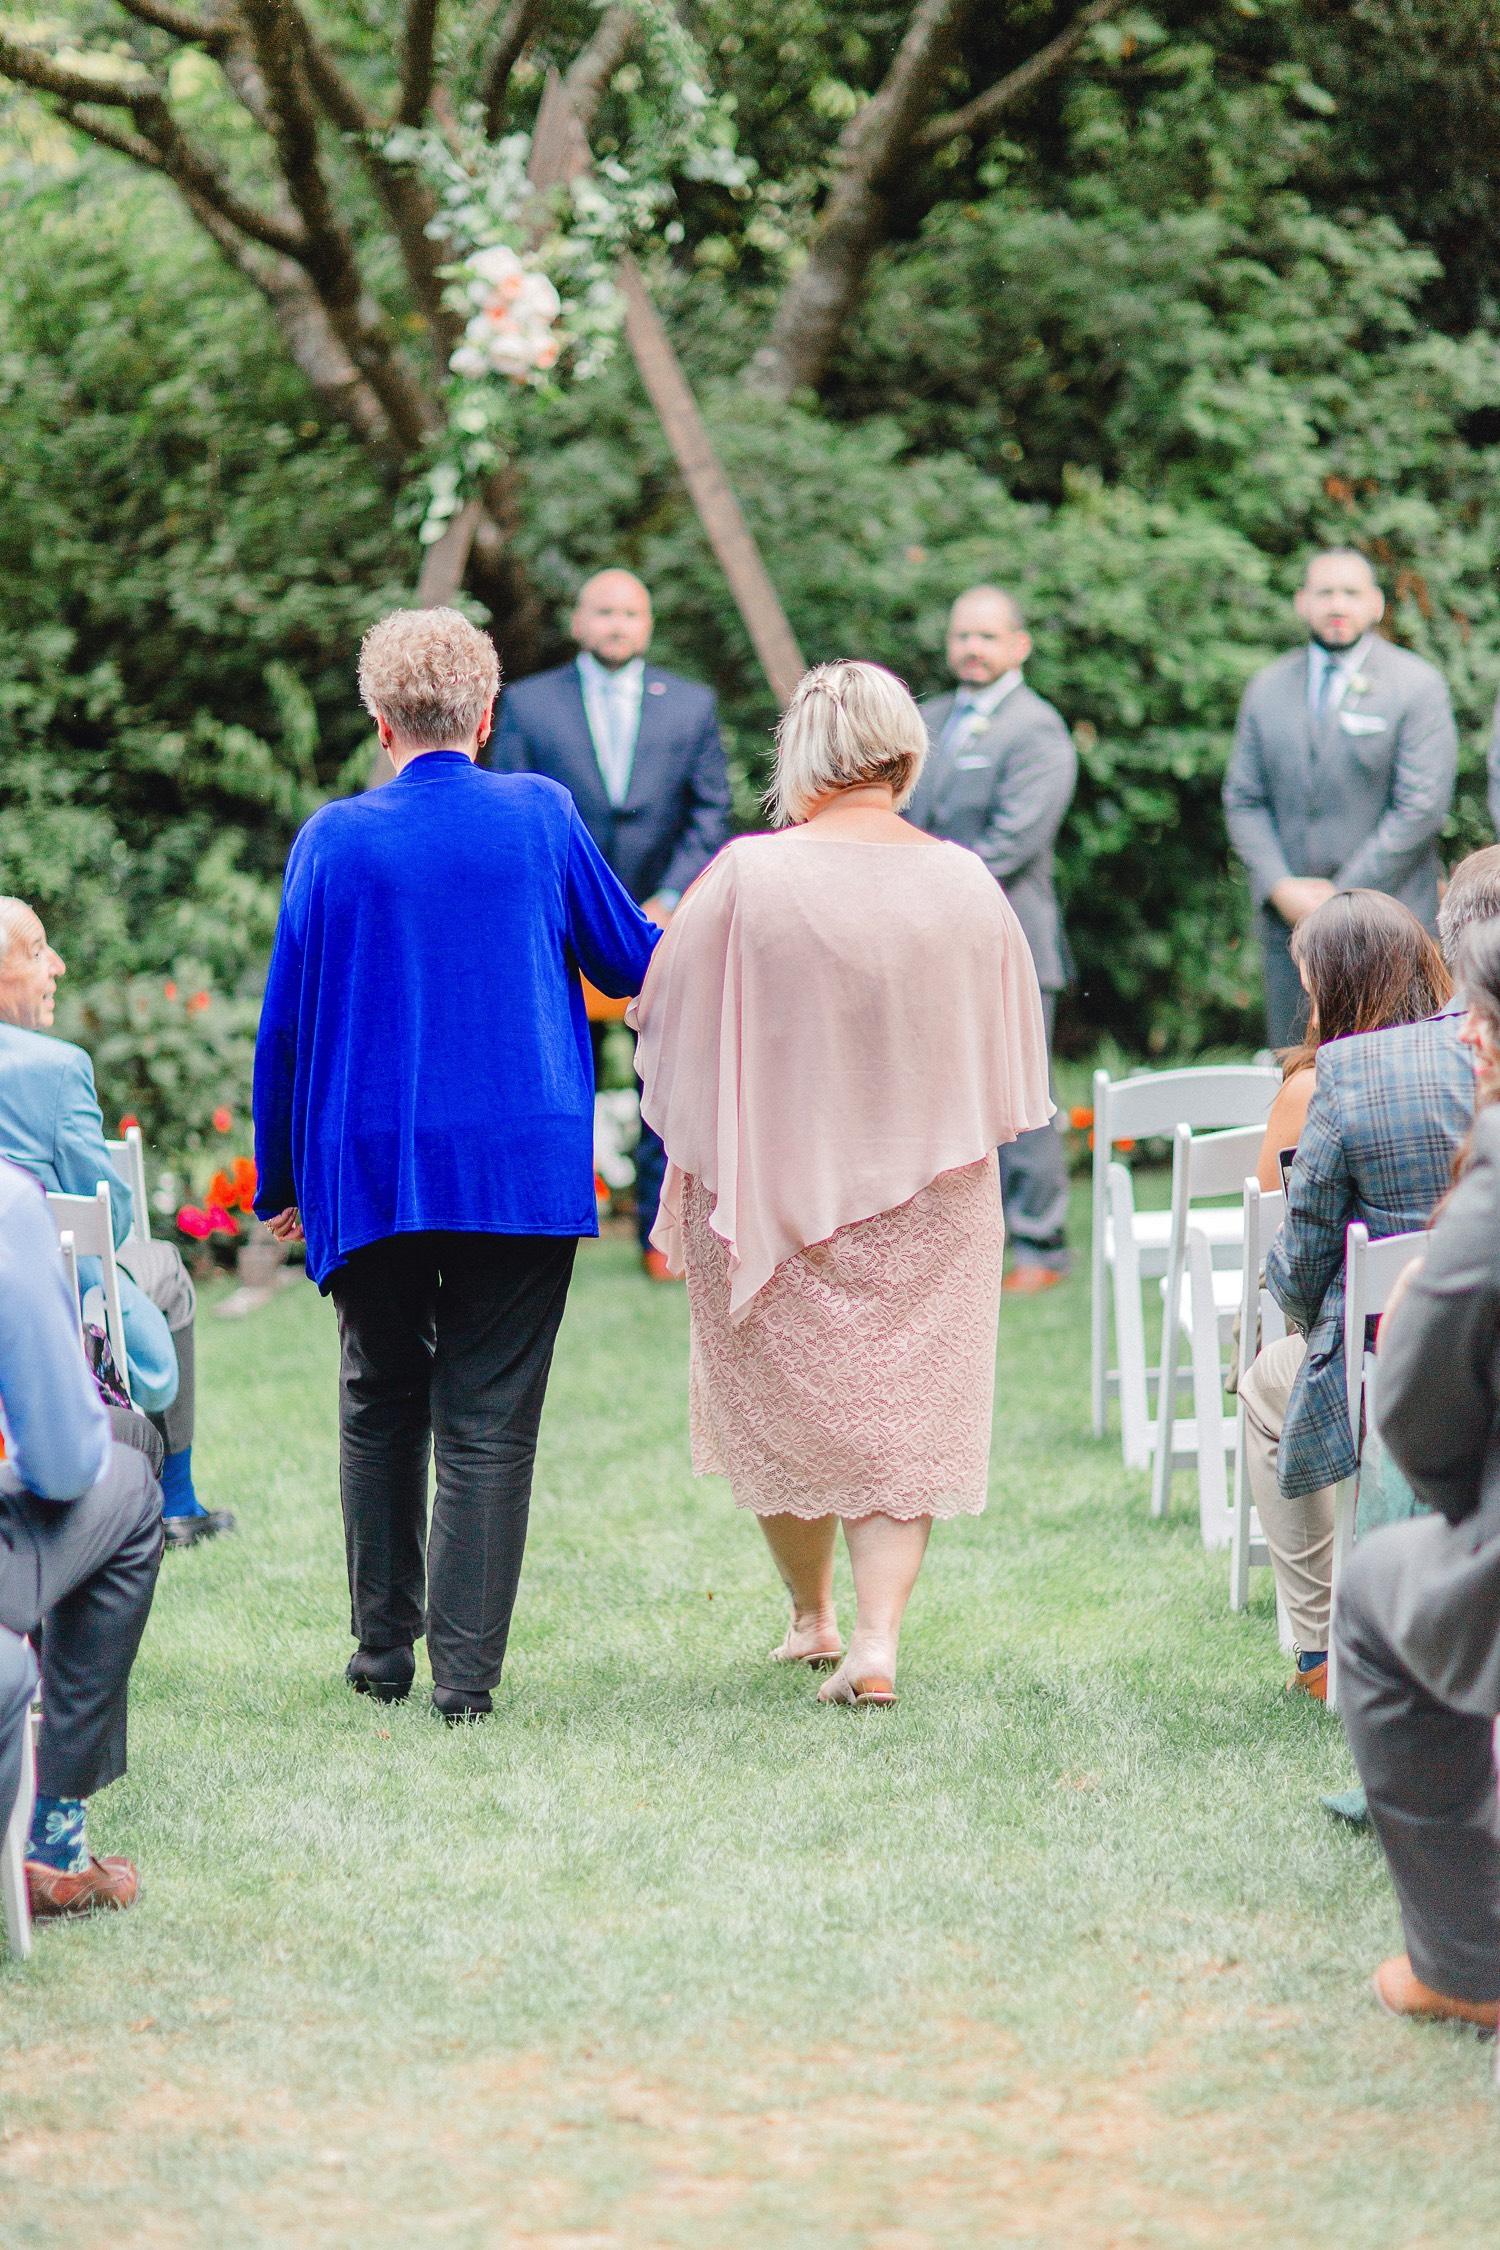 0000000000046_emmarosecompany_katiematt-7702_Photographer_PNW_House_Robinswood_Emma_Light_Company_Airy_Rose_and_Wedding_Seattle.jpg